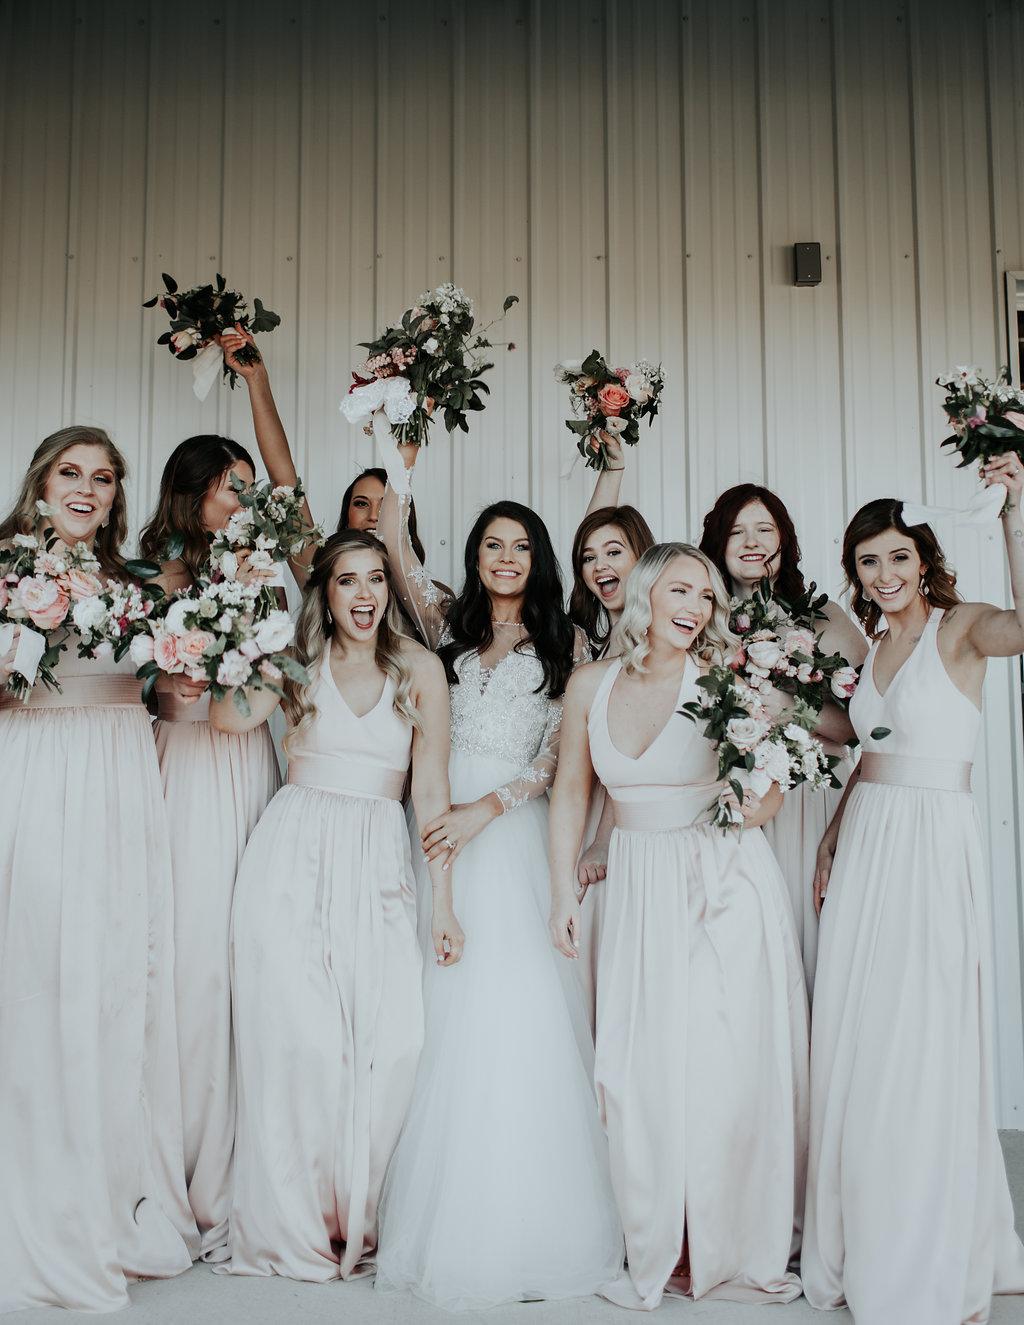 Tulsa Wedding Venue white barn 8.jpg